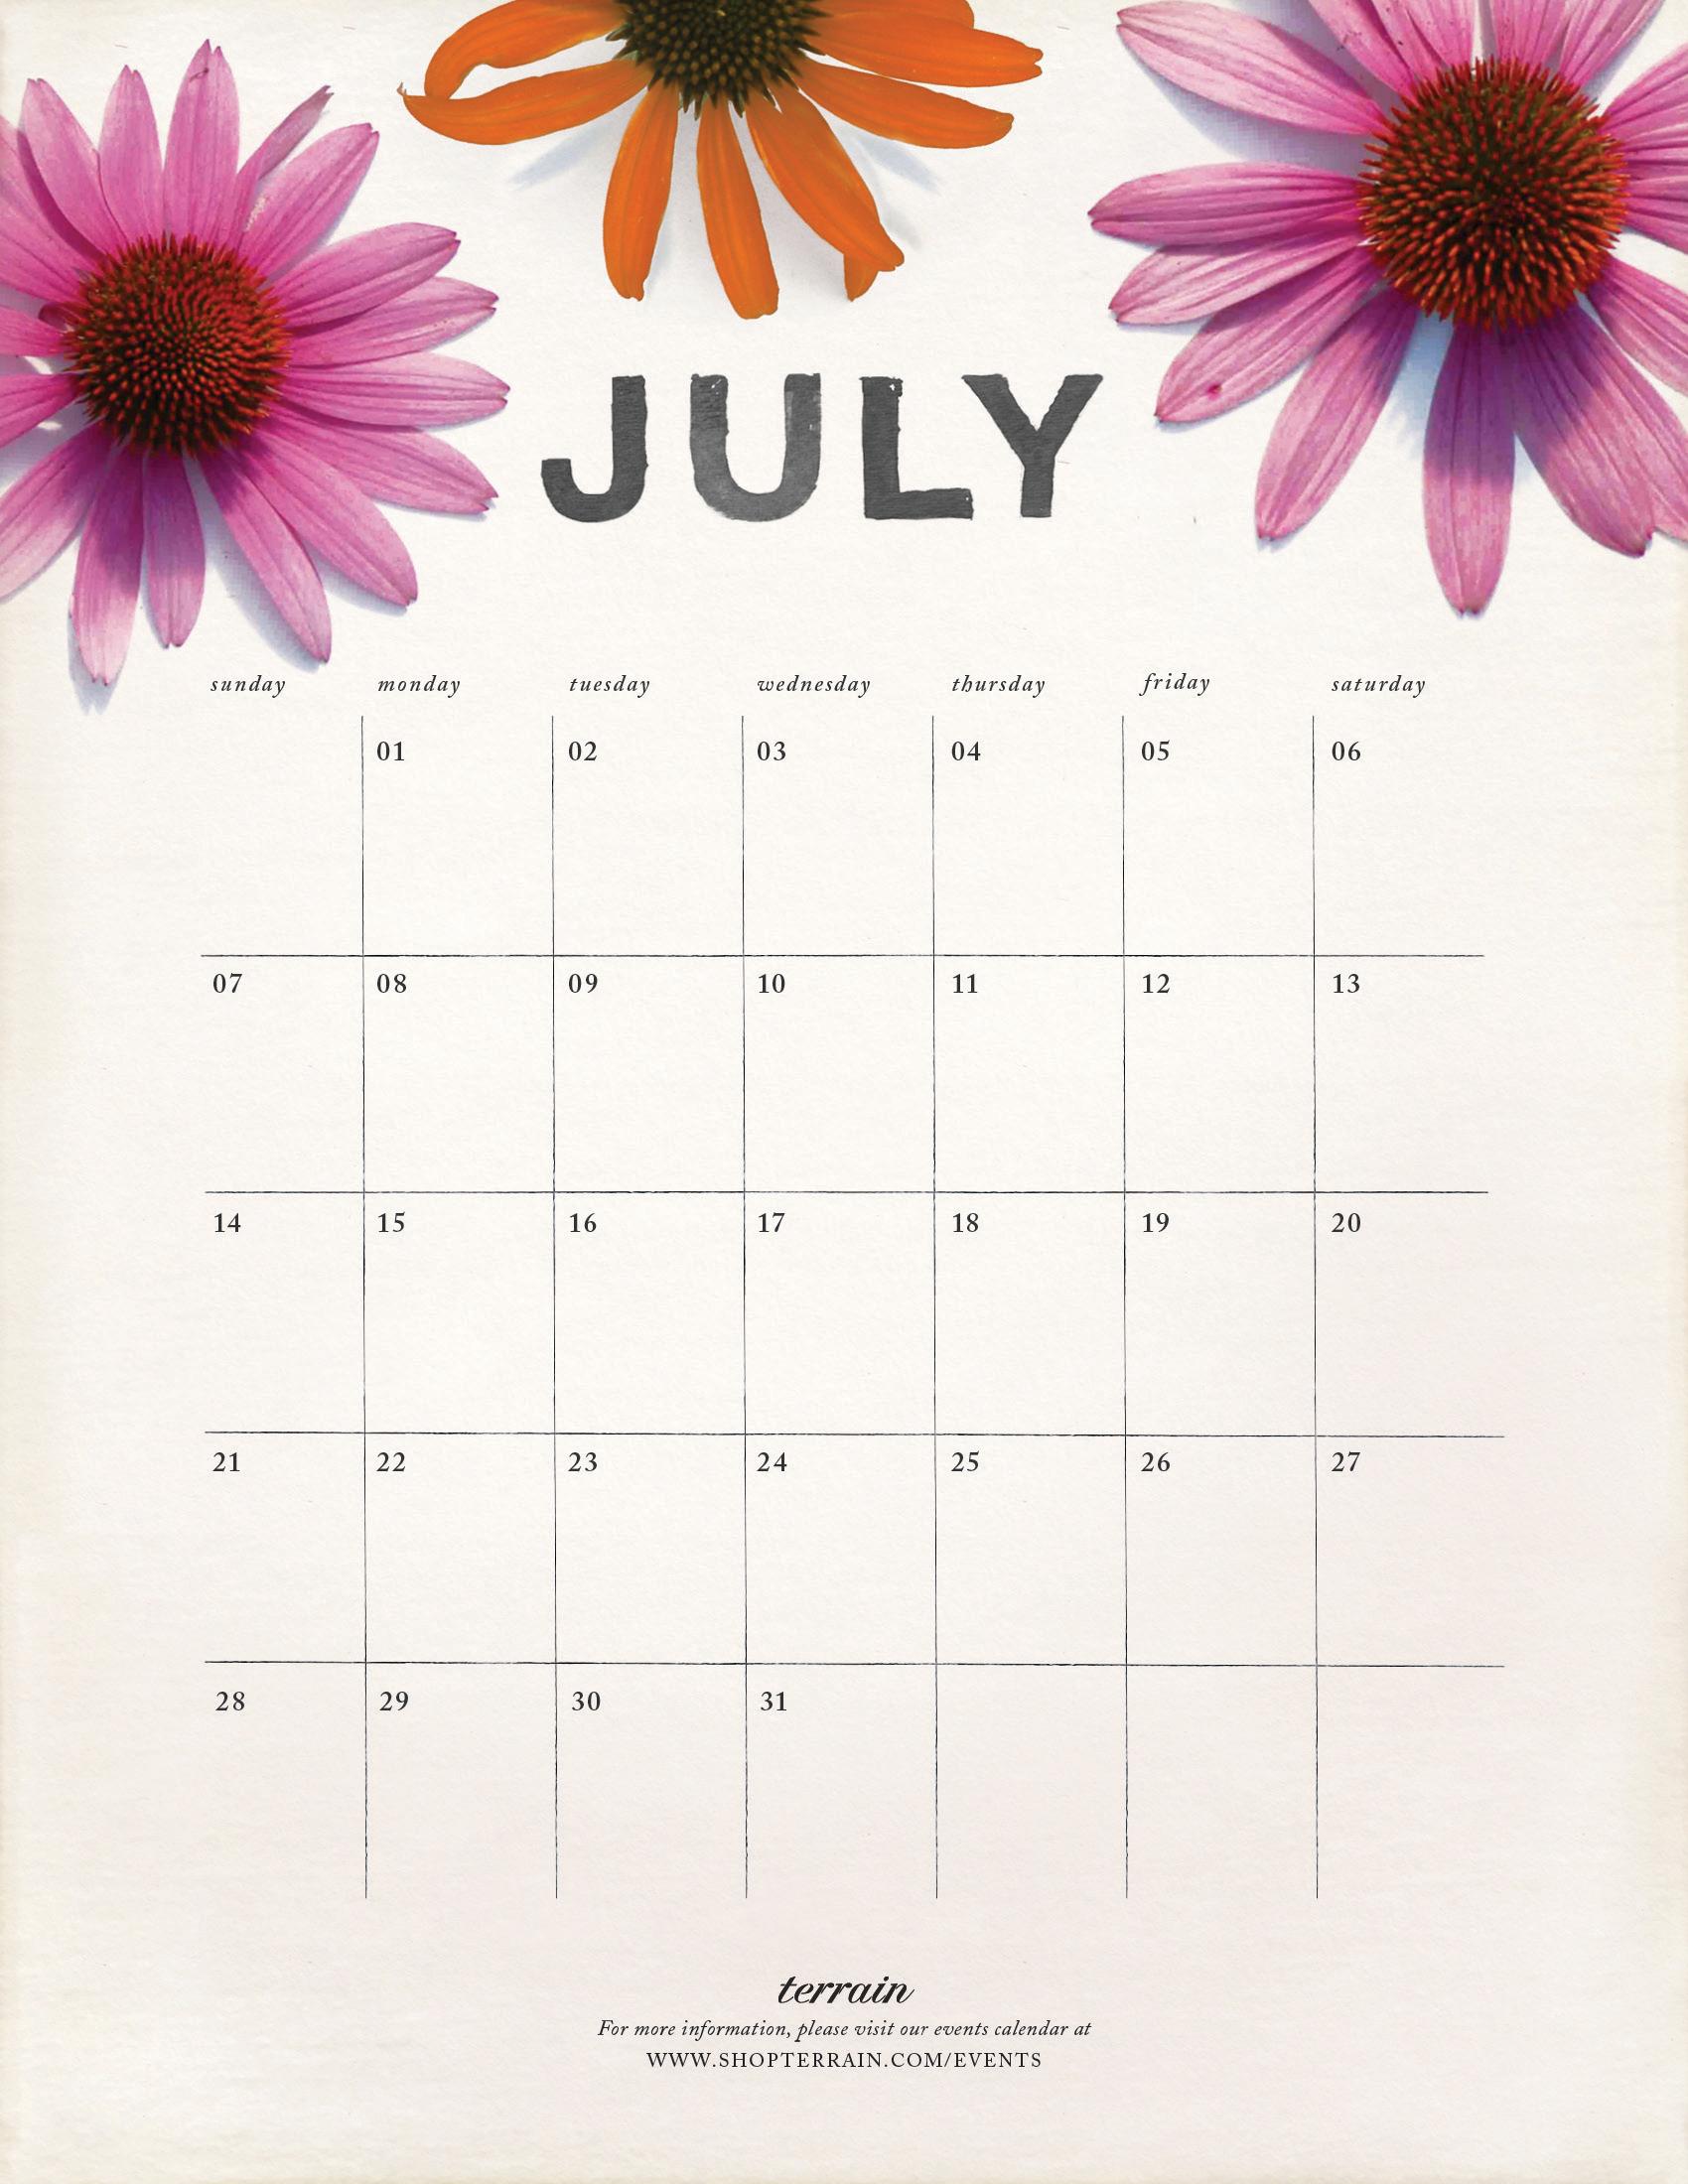 1700 x 2200 jpeg 1188kB, Typable Calendar July 2013 | New Calendar ...